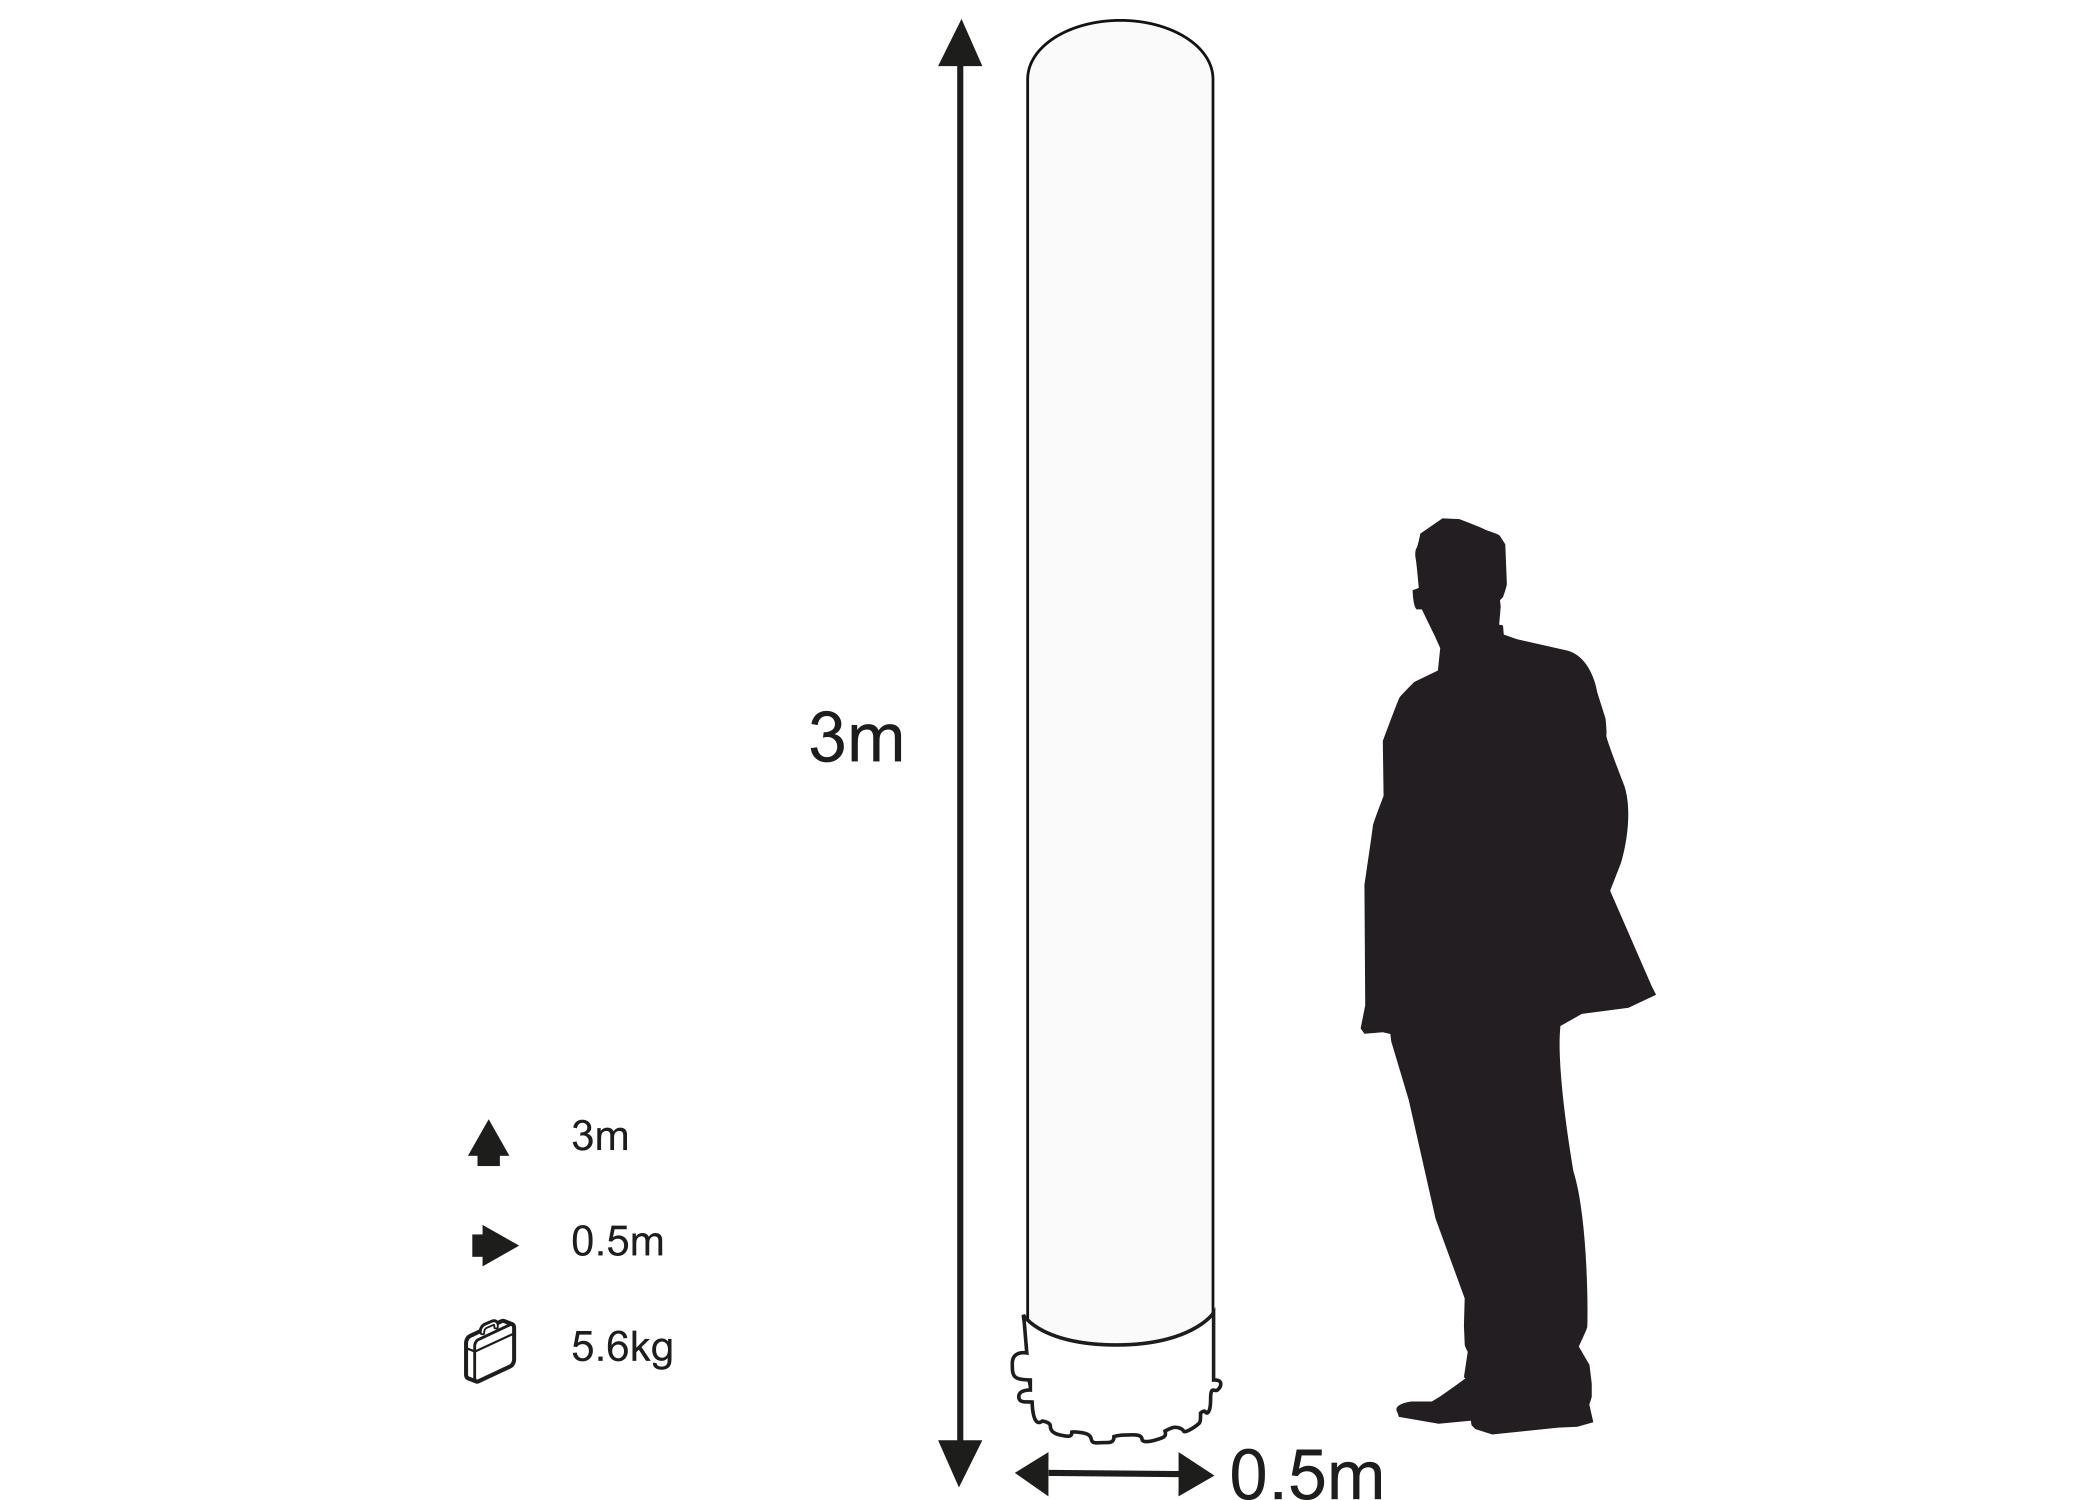 inflatable_column_sizechart.png